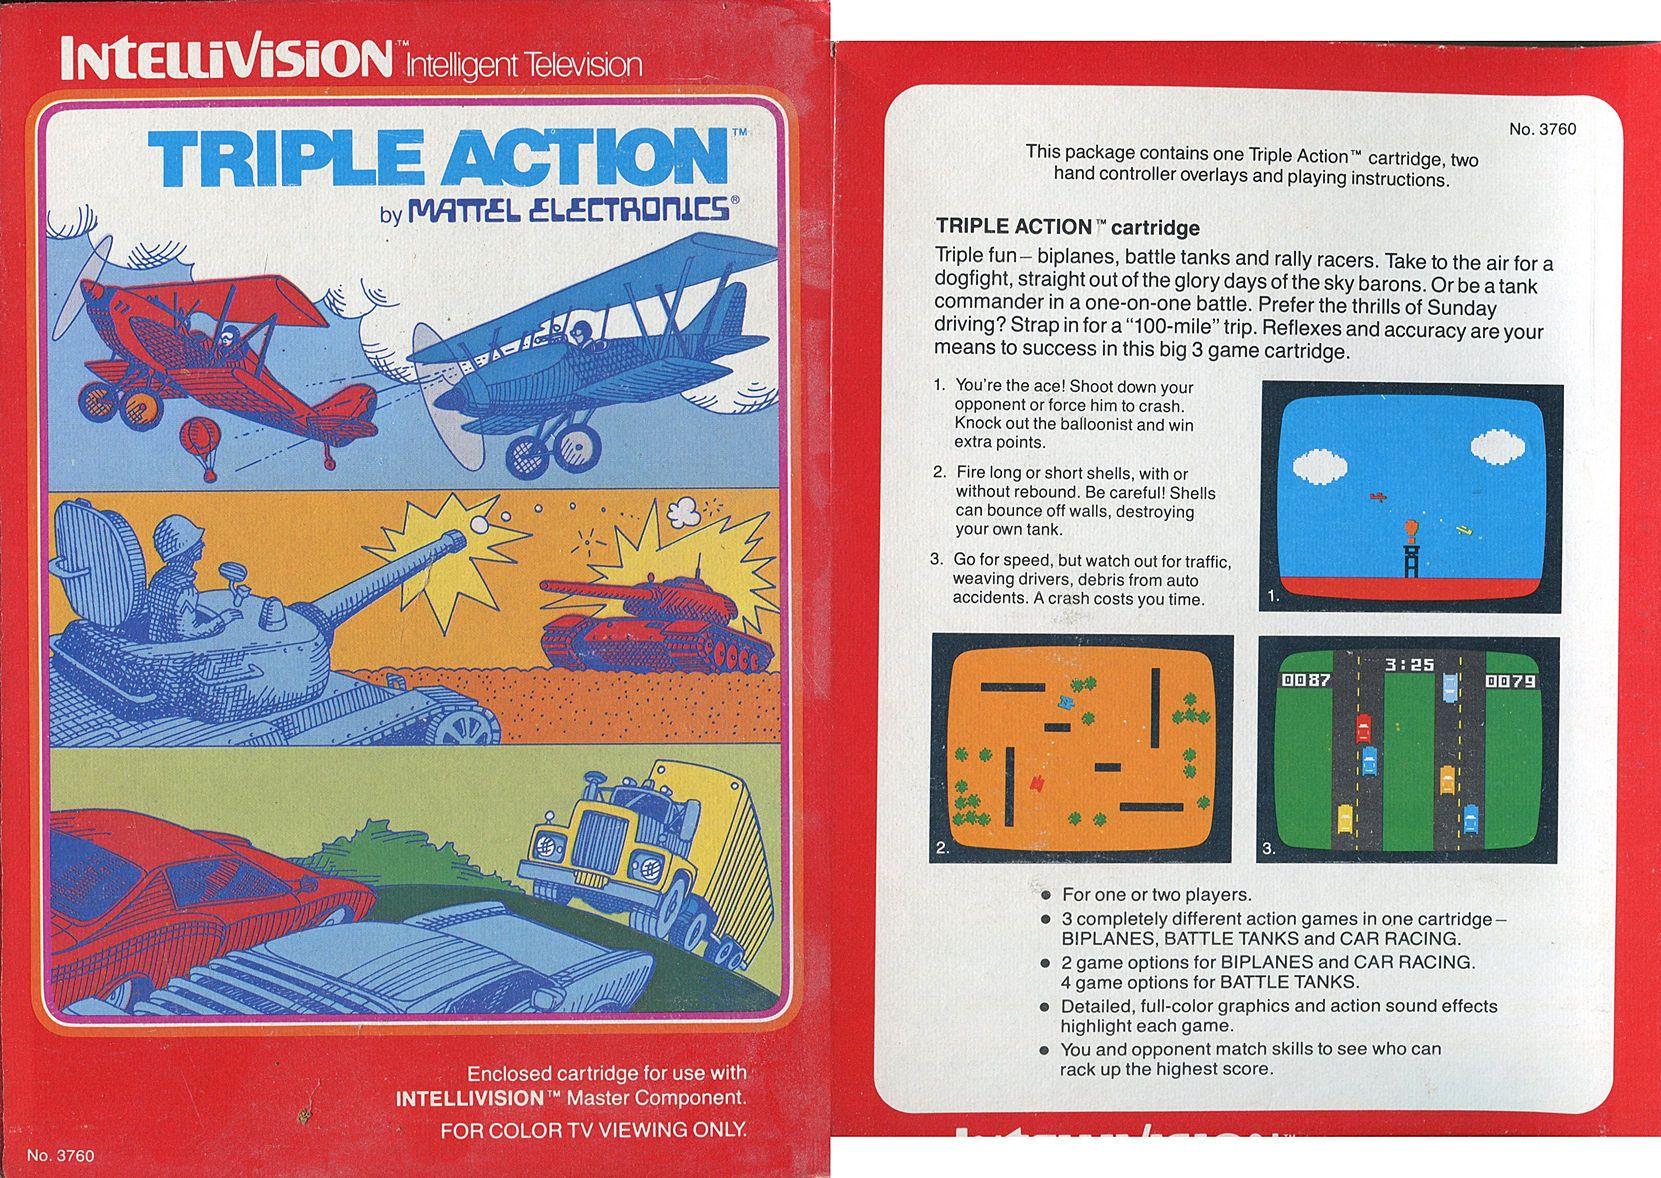 Intellivision Triple Action.jpg (1661×1178)